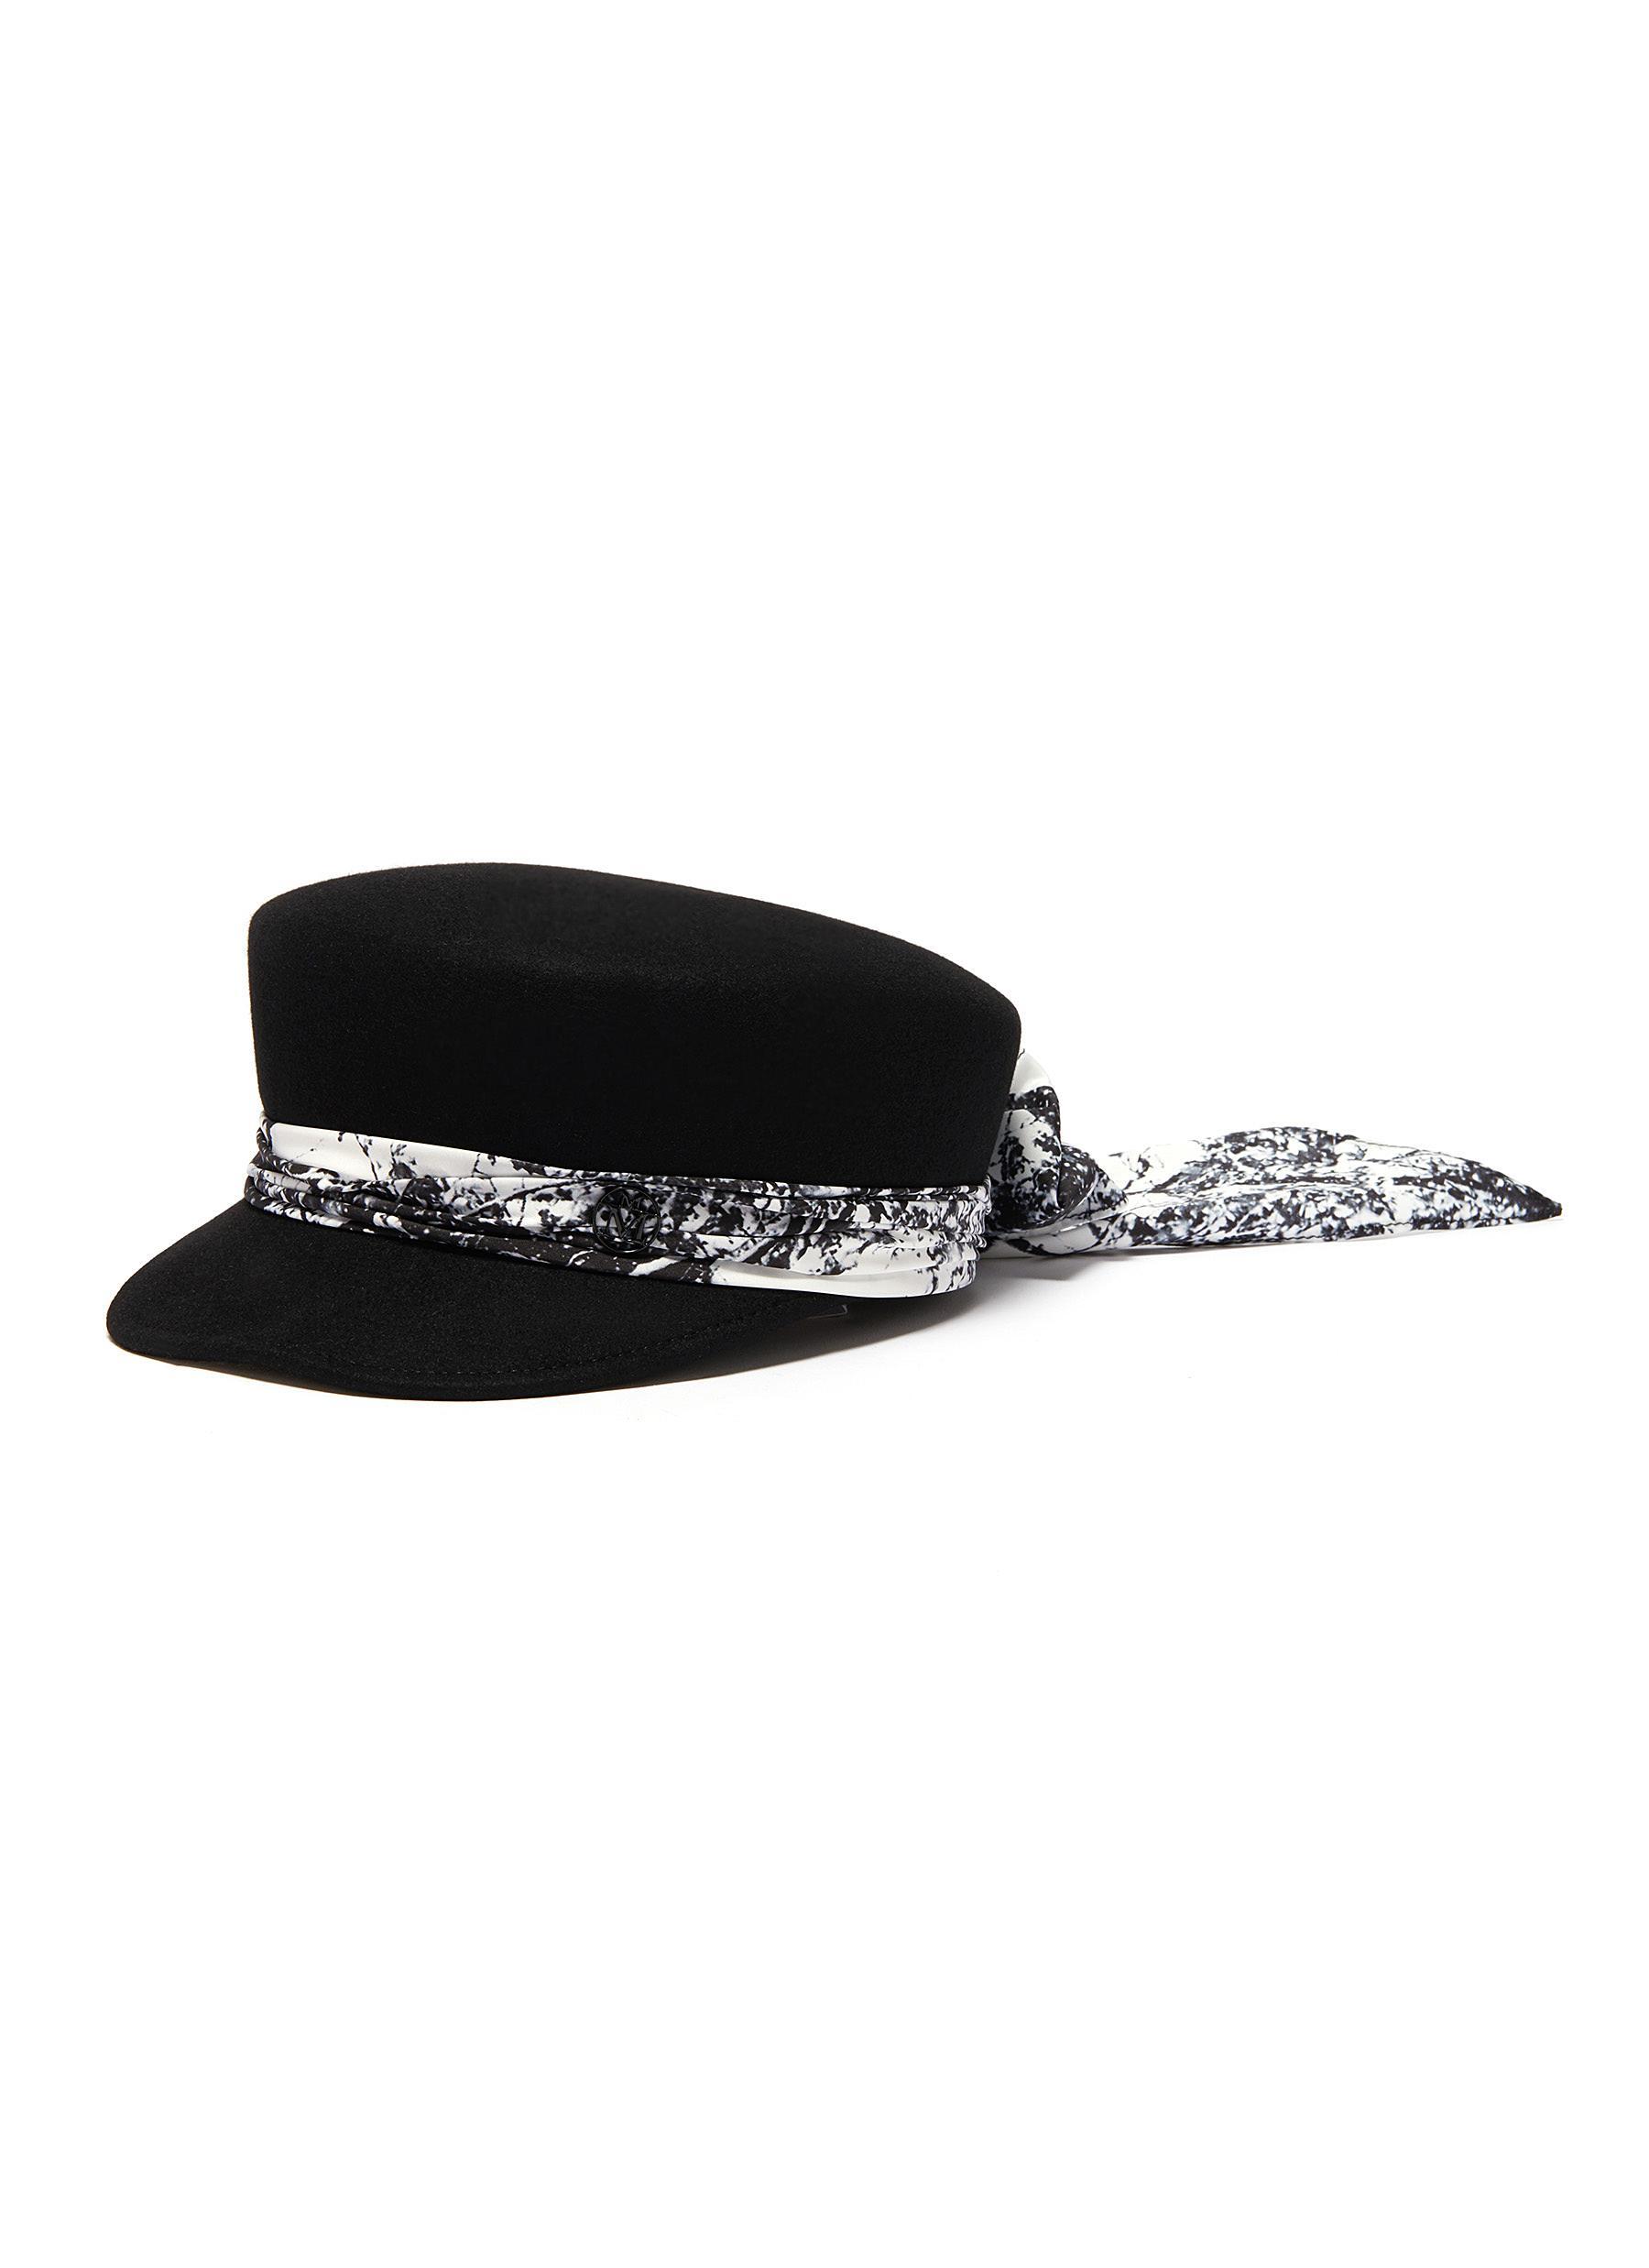 Maison Michel Accessories 'Abby' scarf newsboy cap